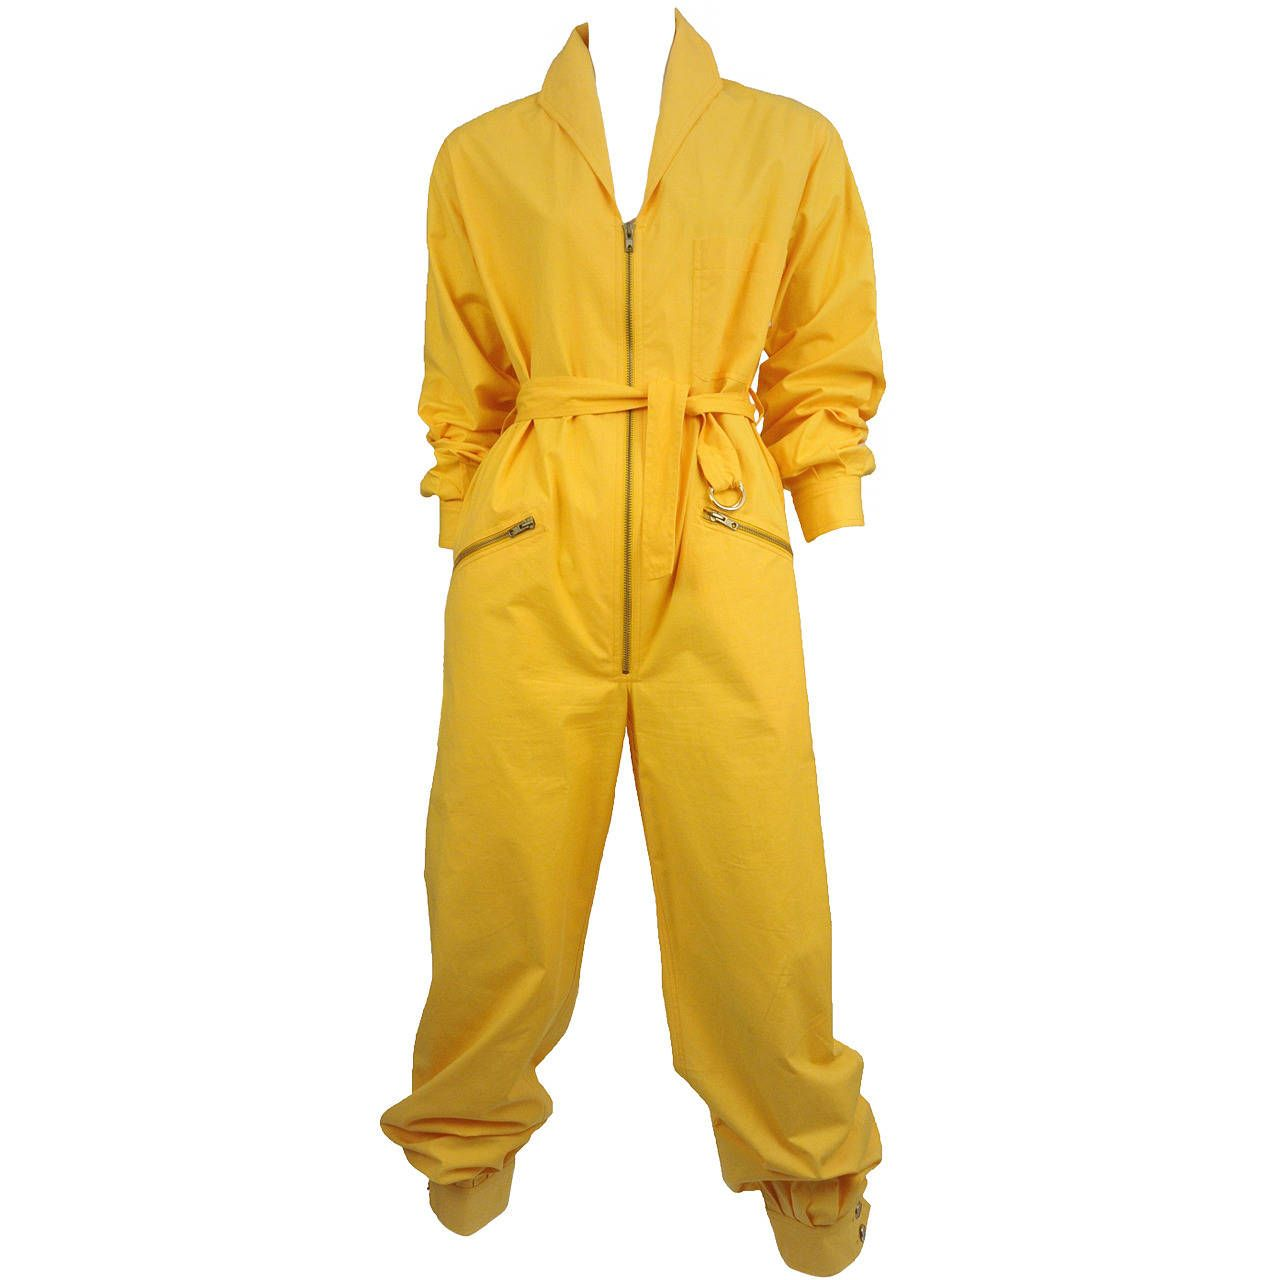 7b2f819c1c68ab Yves Saint Laurent Yellow Cotton Mechanics Romper in 2019